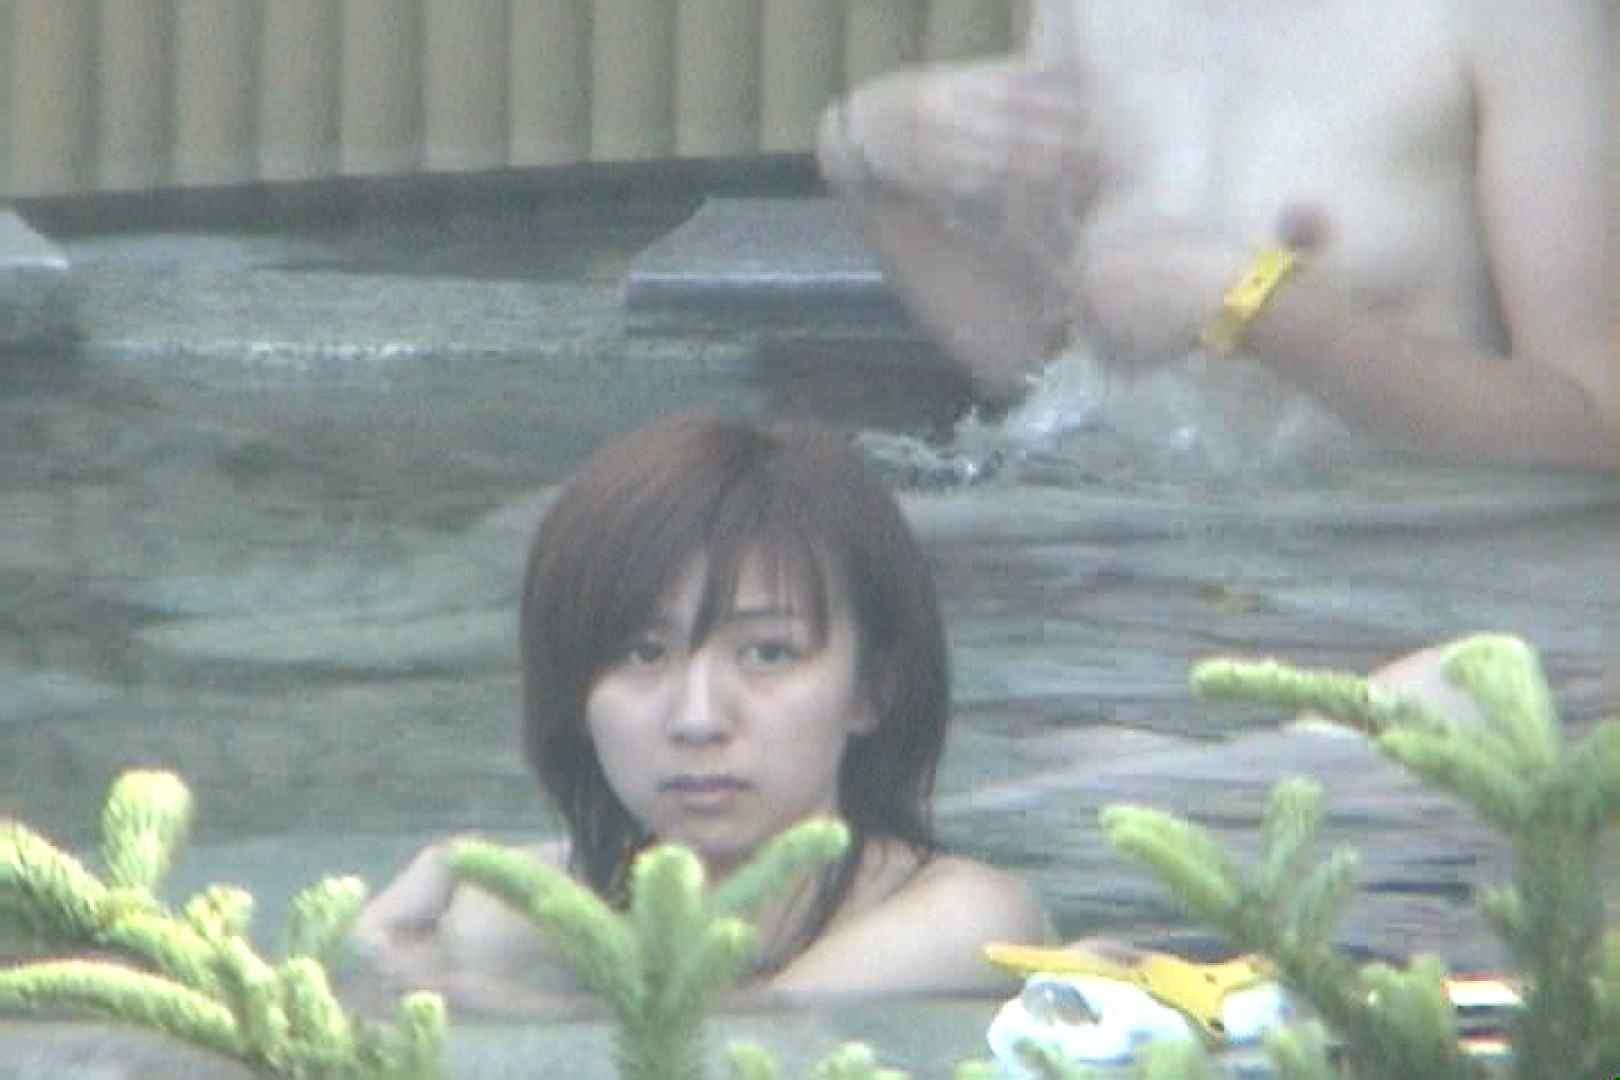 Aquaな露天風呂Vol.77【VIP限定】 露天   盗撮特集  98画像 76